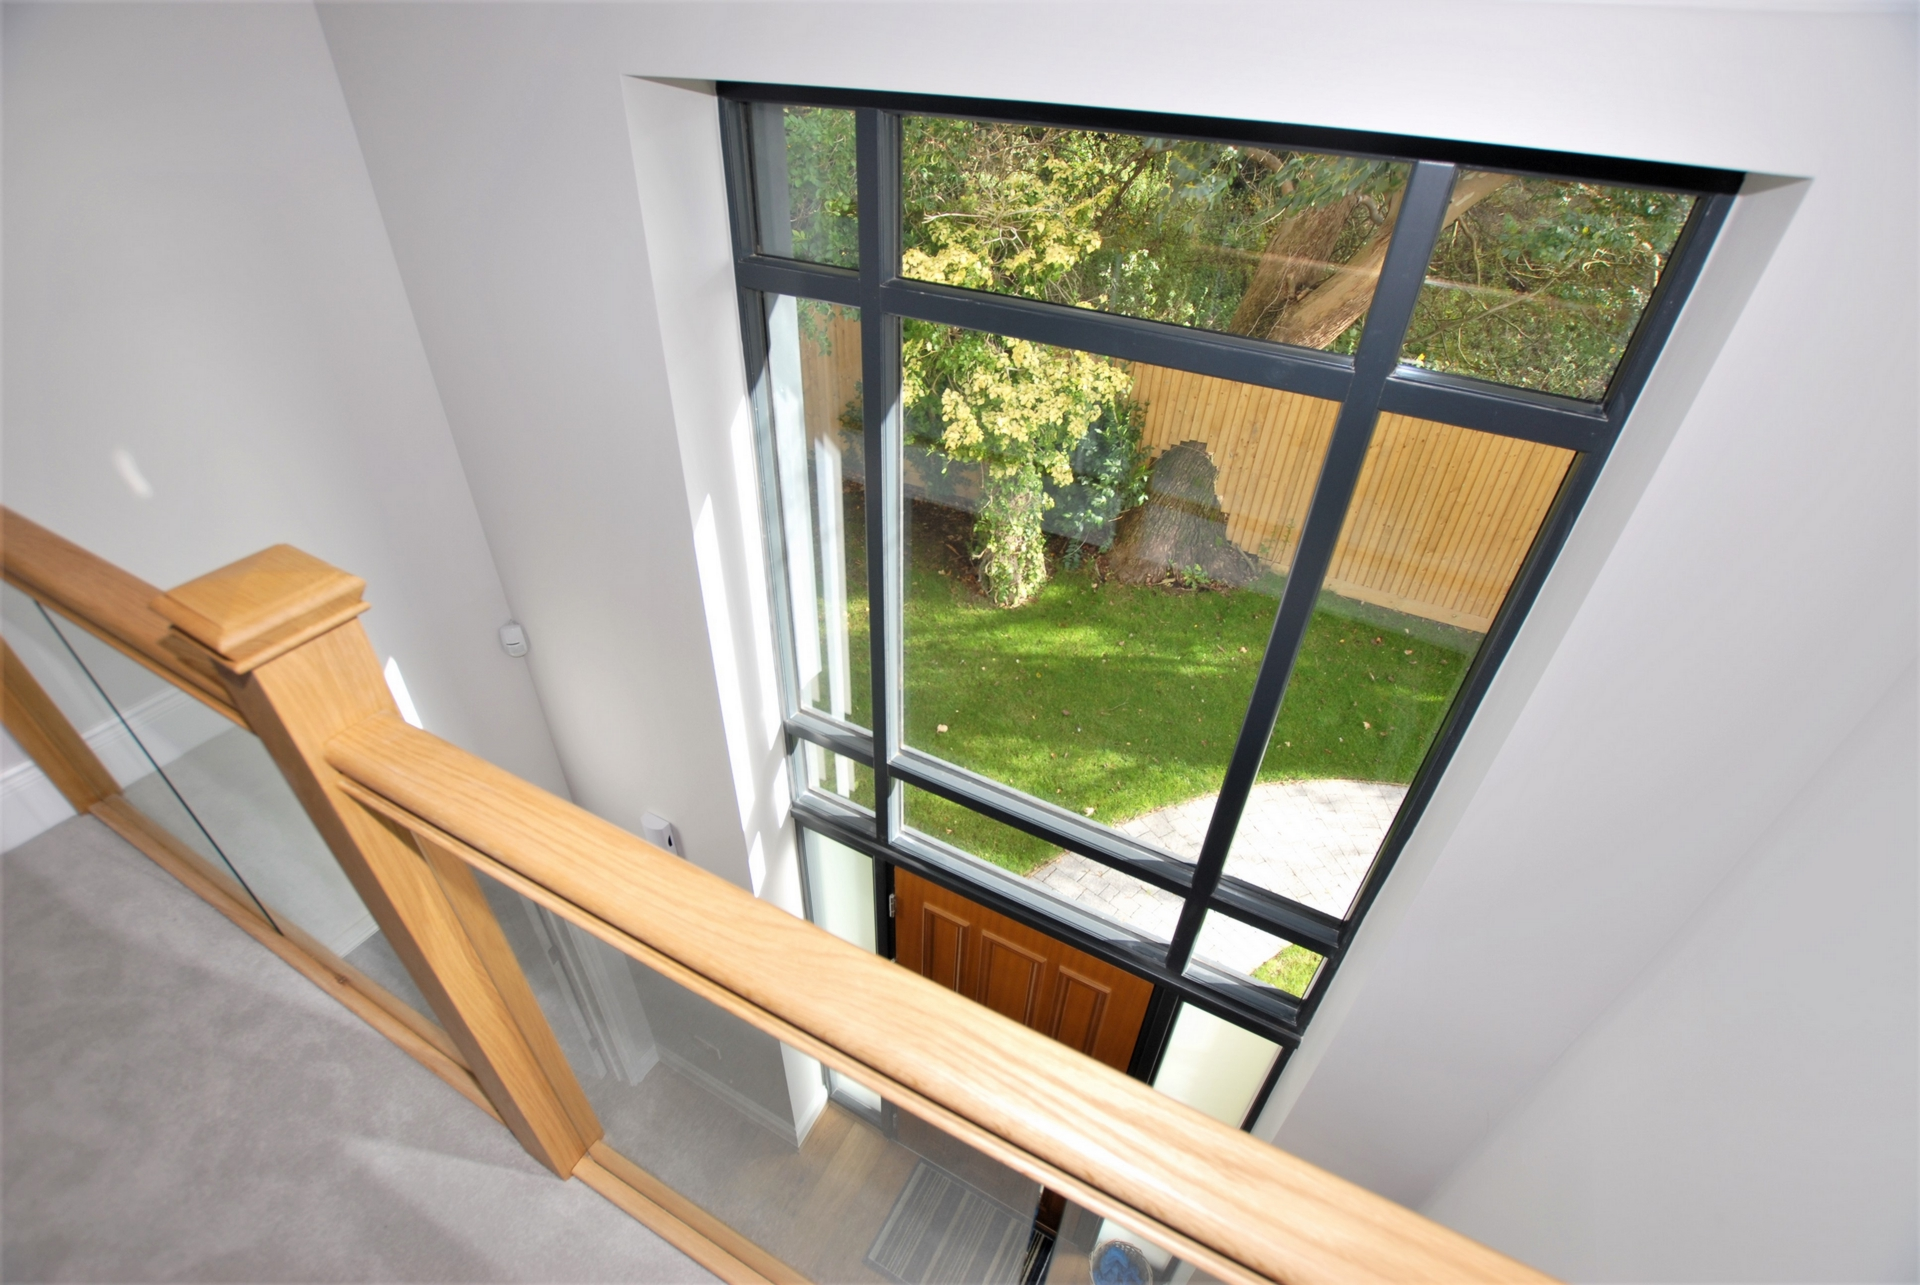 Full height window